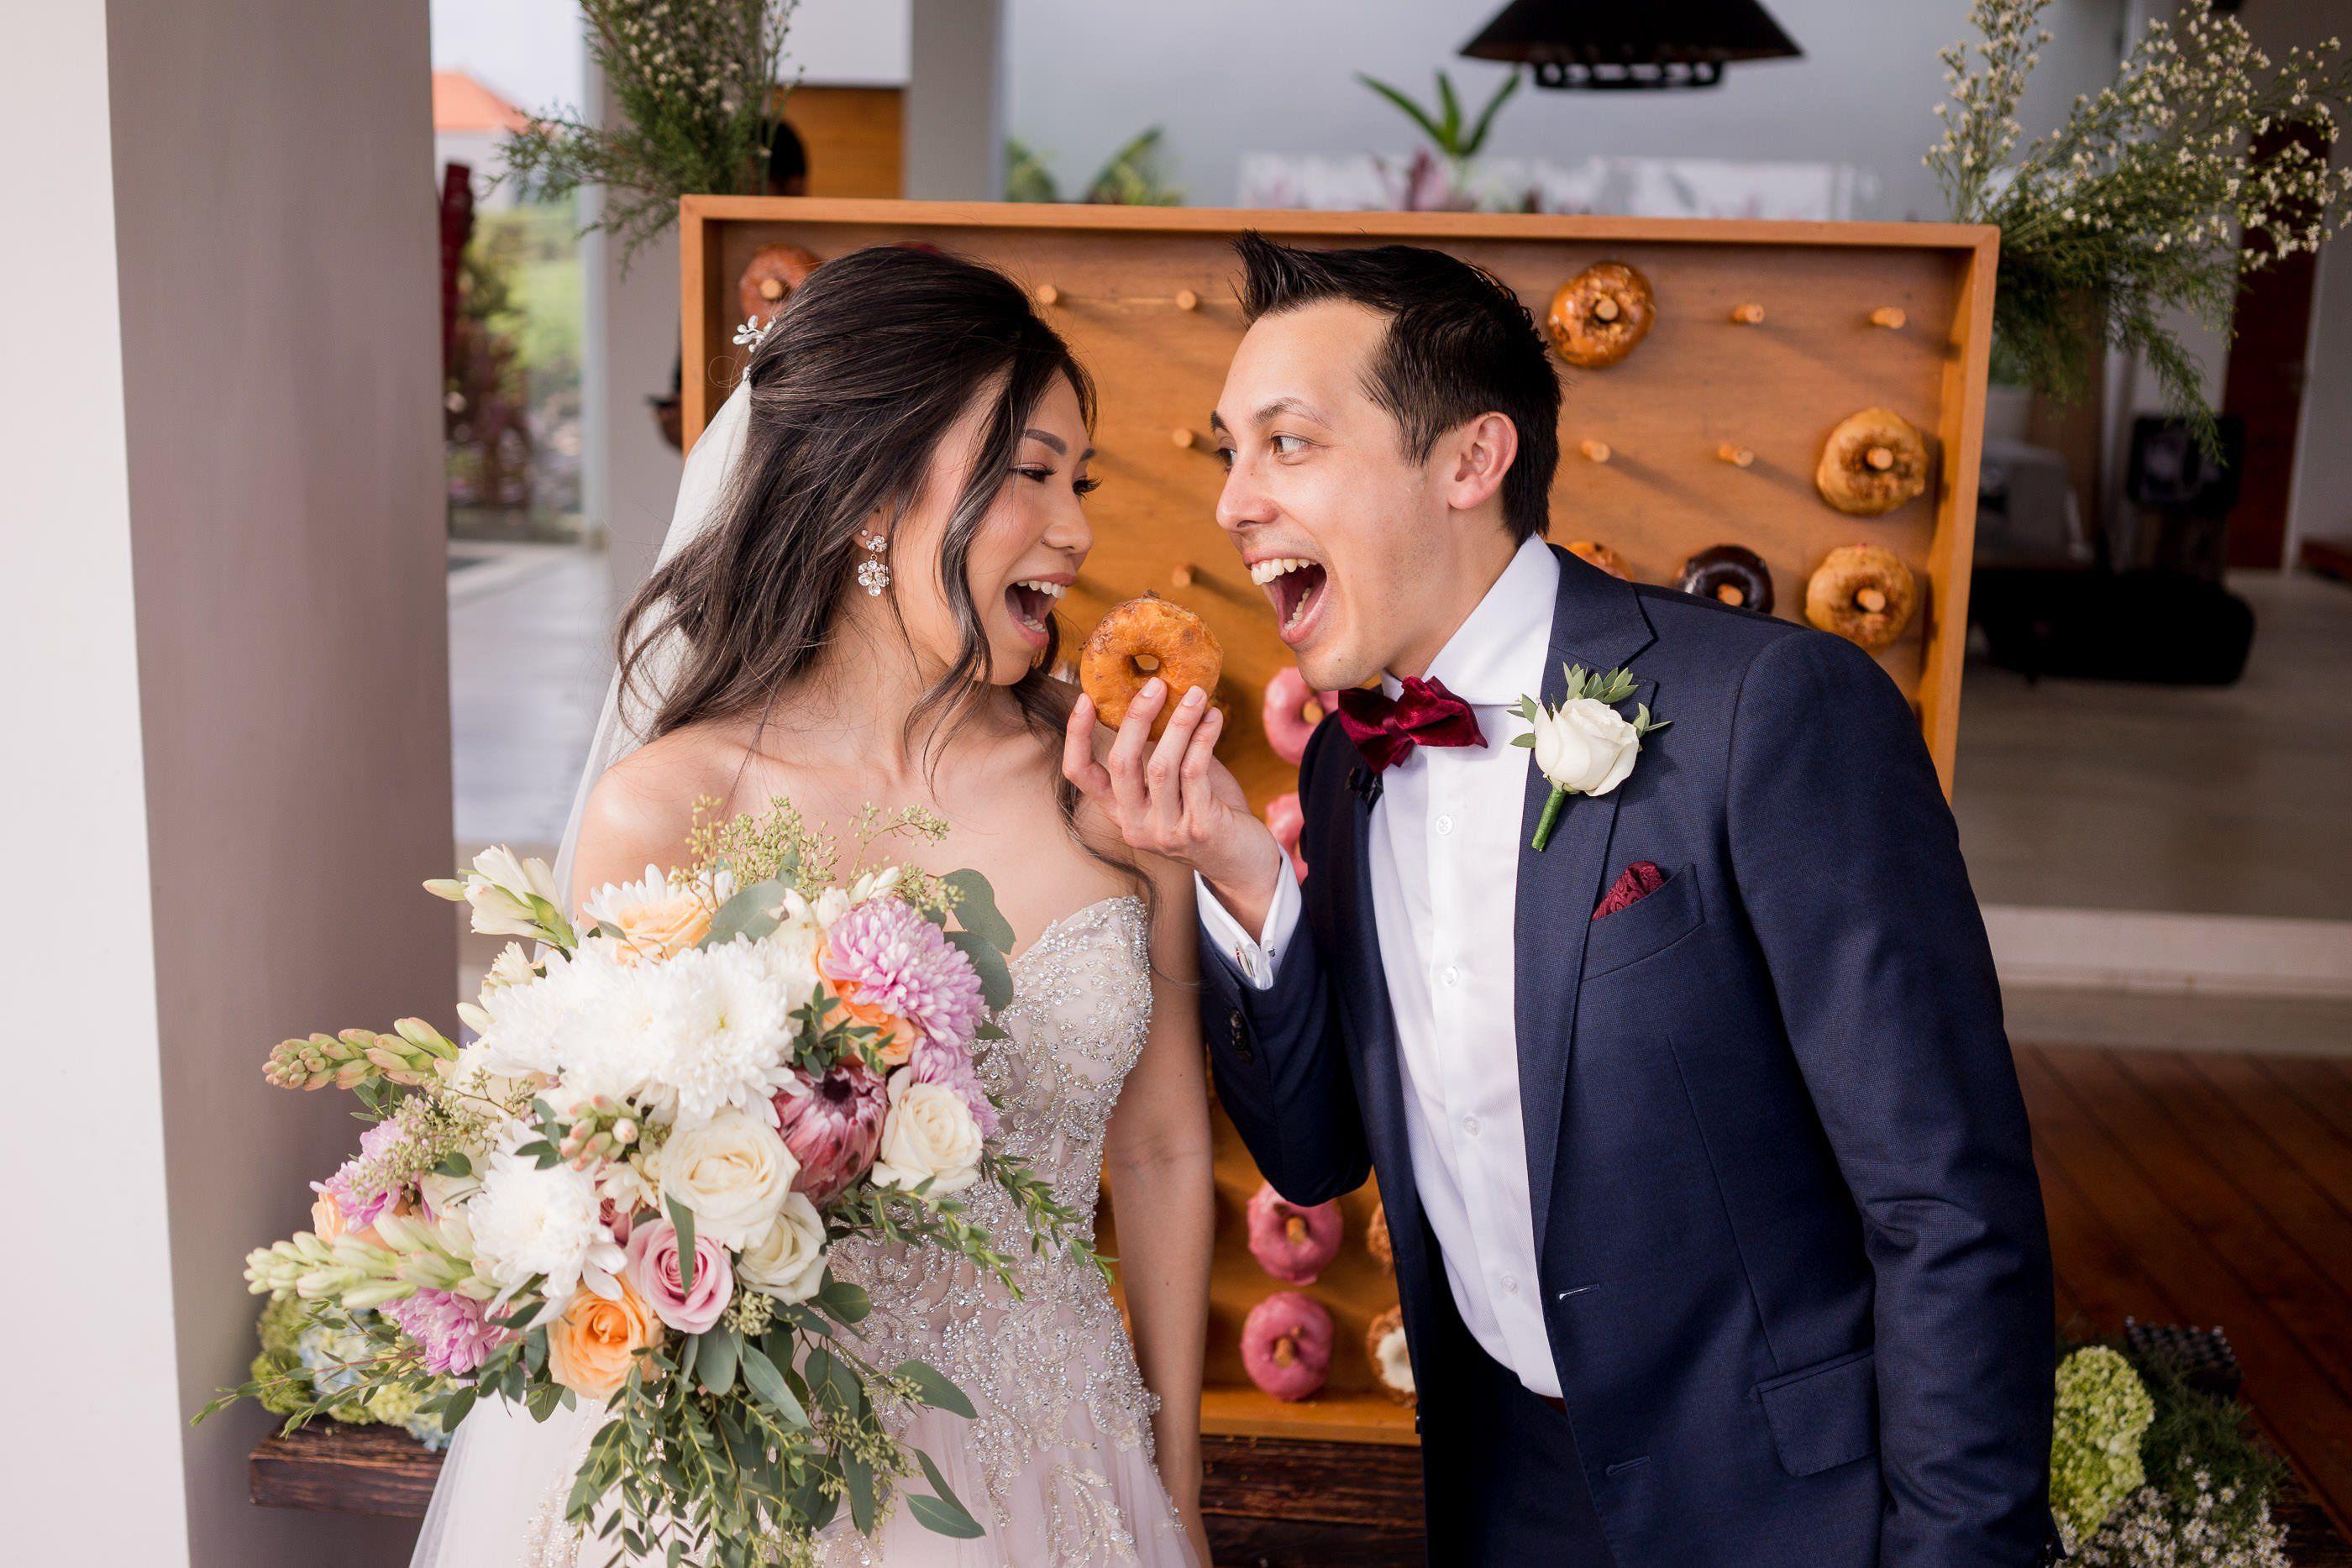 unique destination wedding ideas